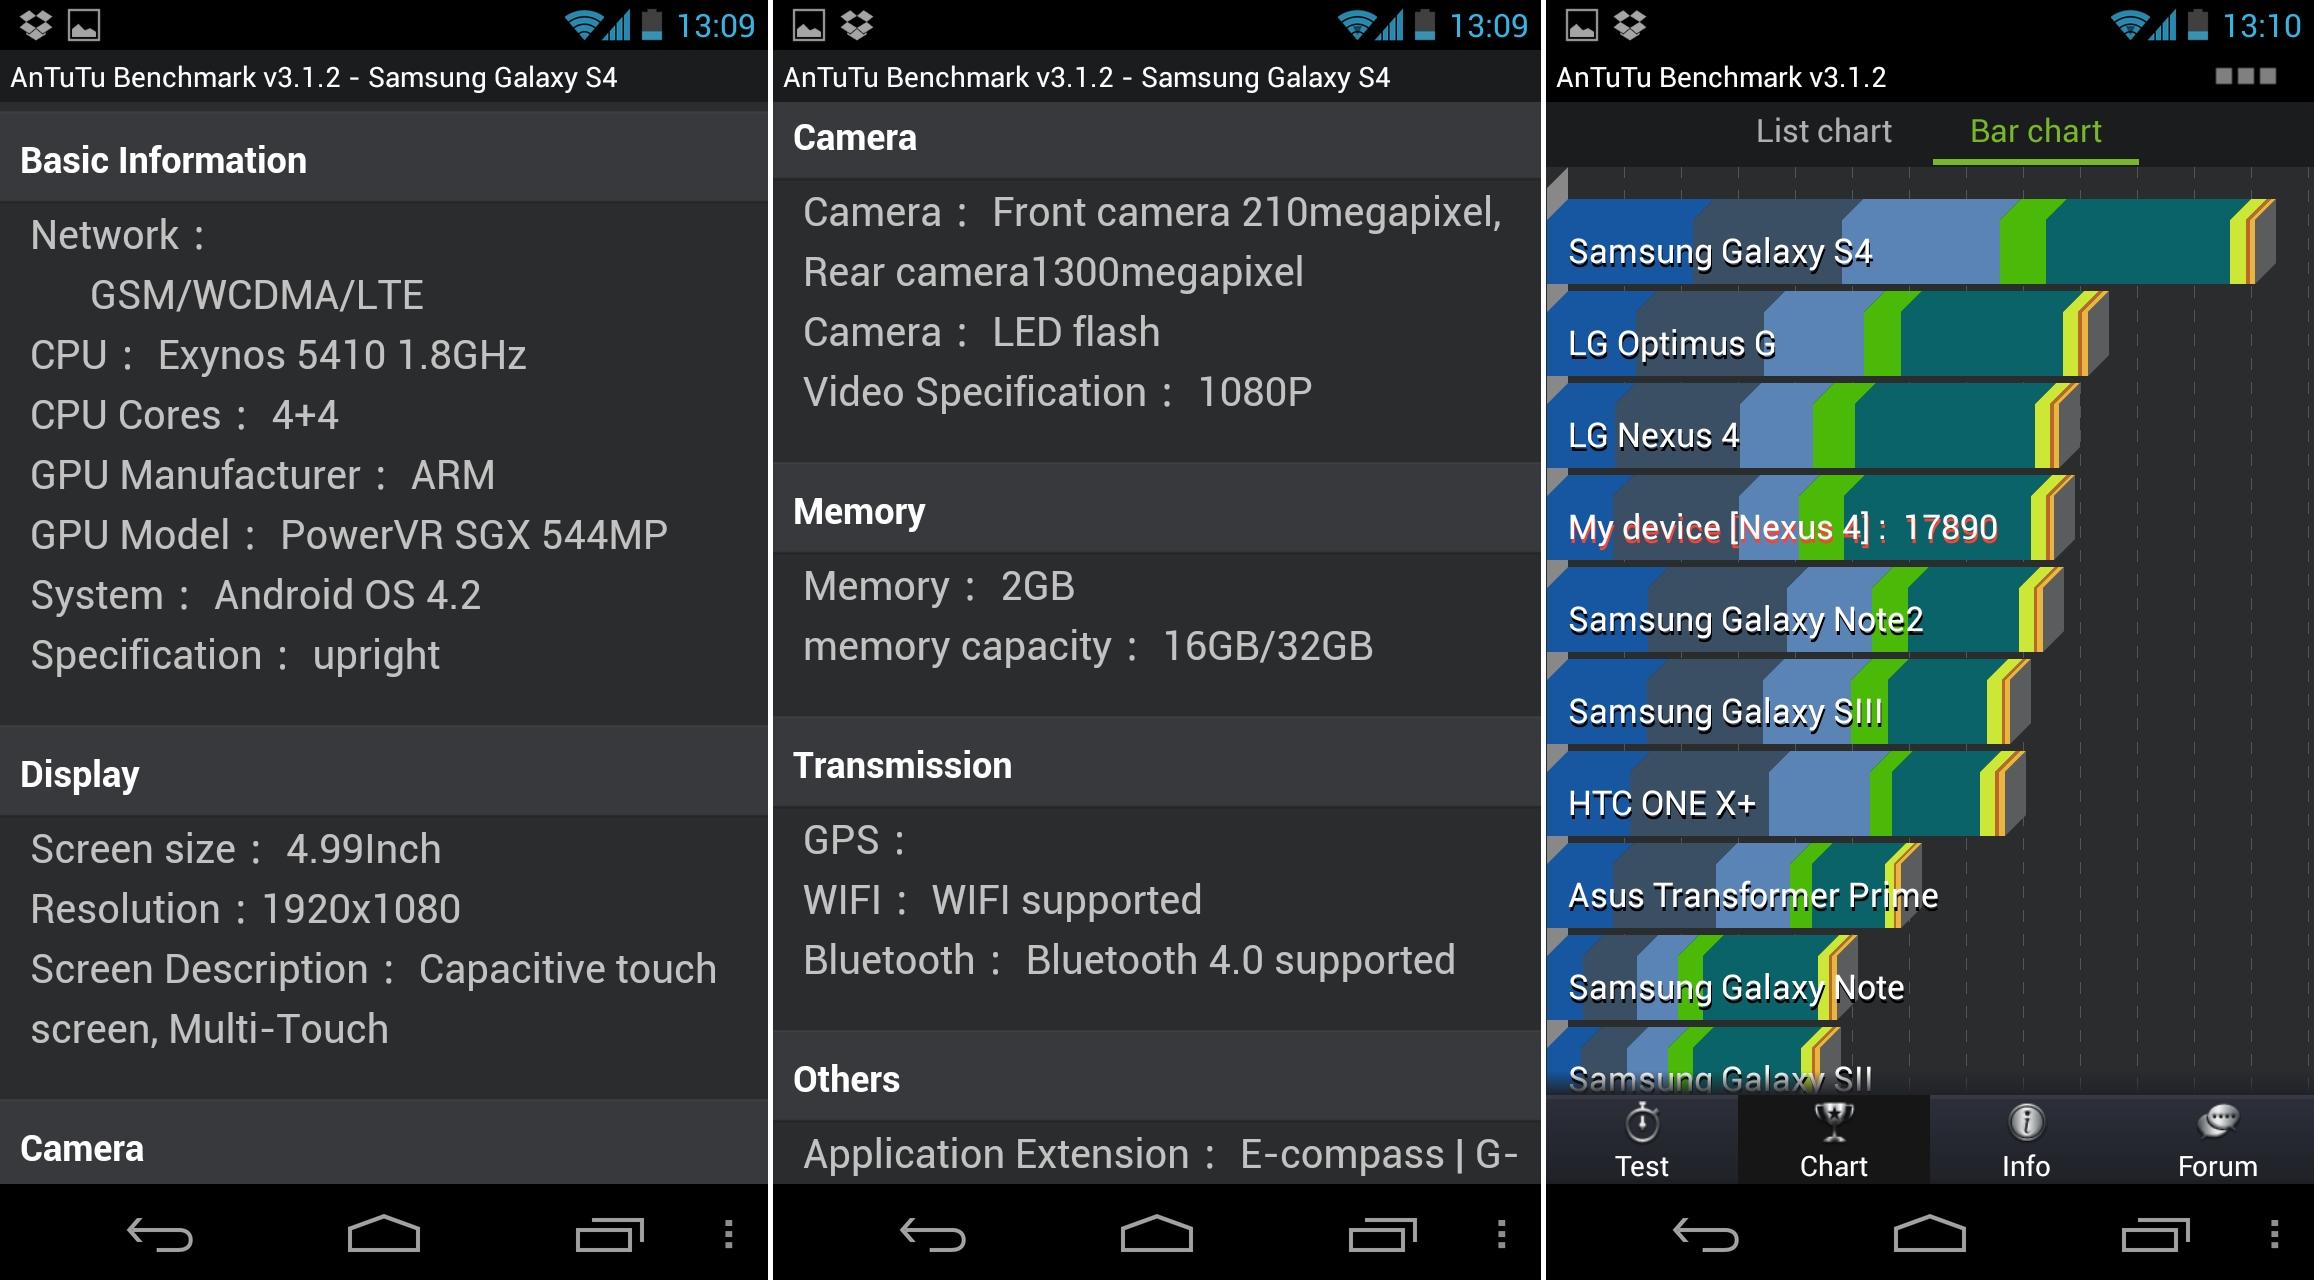 Samsung Galaxy S4 Specifications confirmed via AnTuTu ...